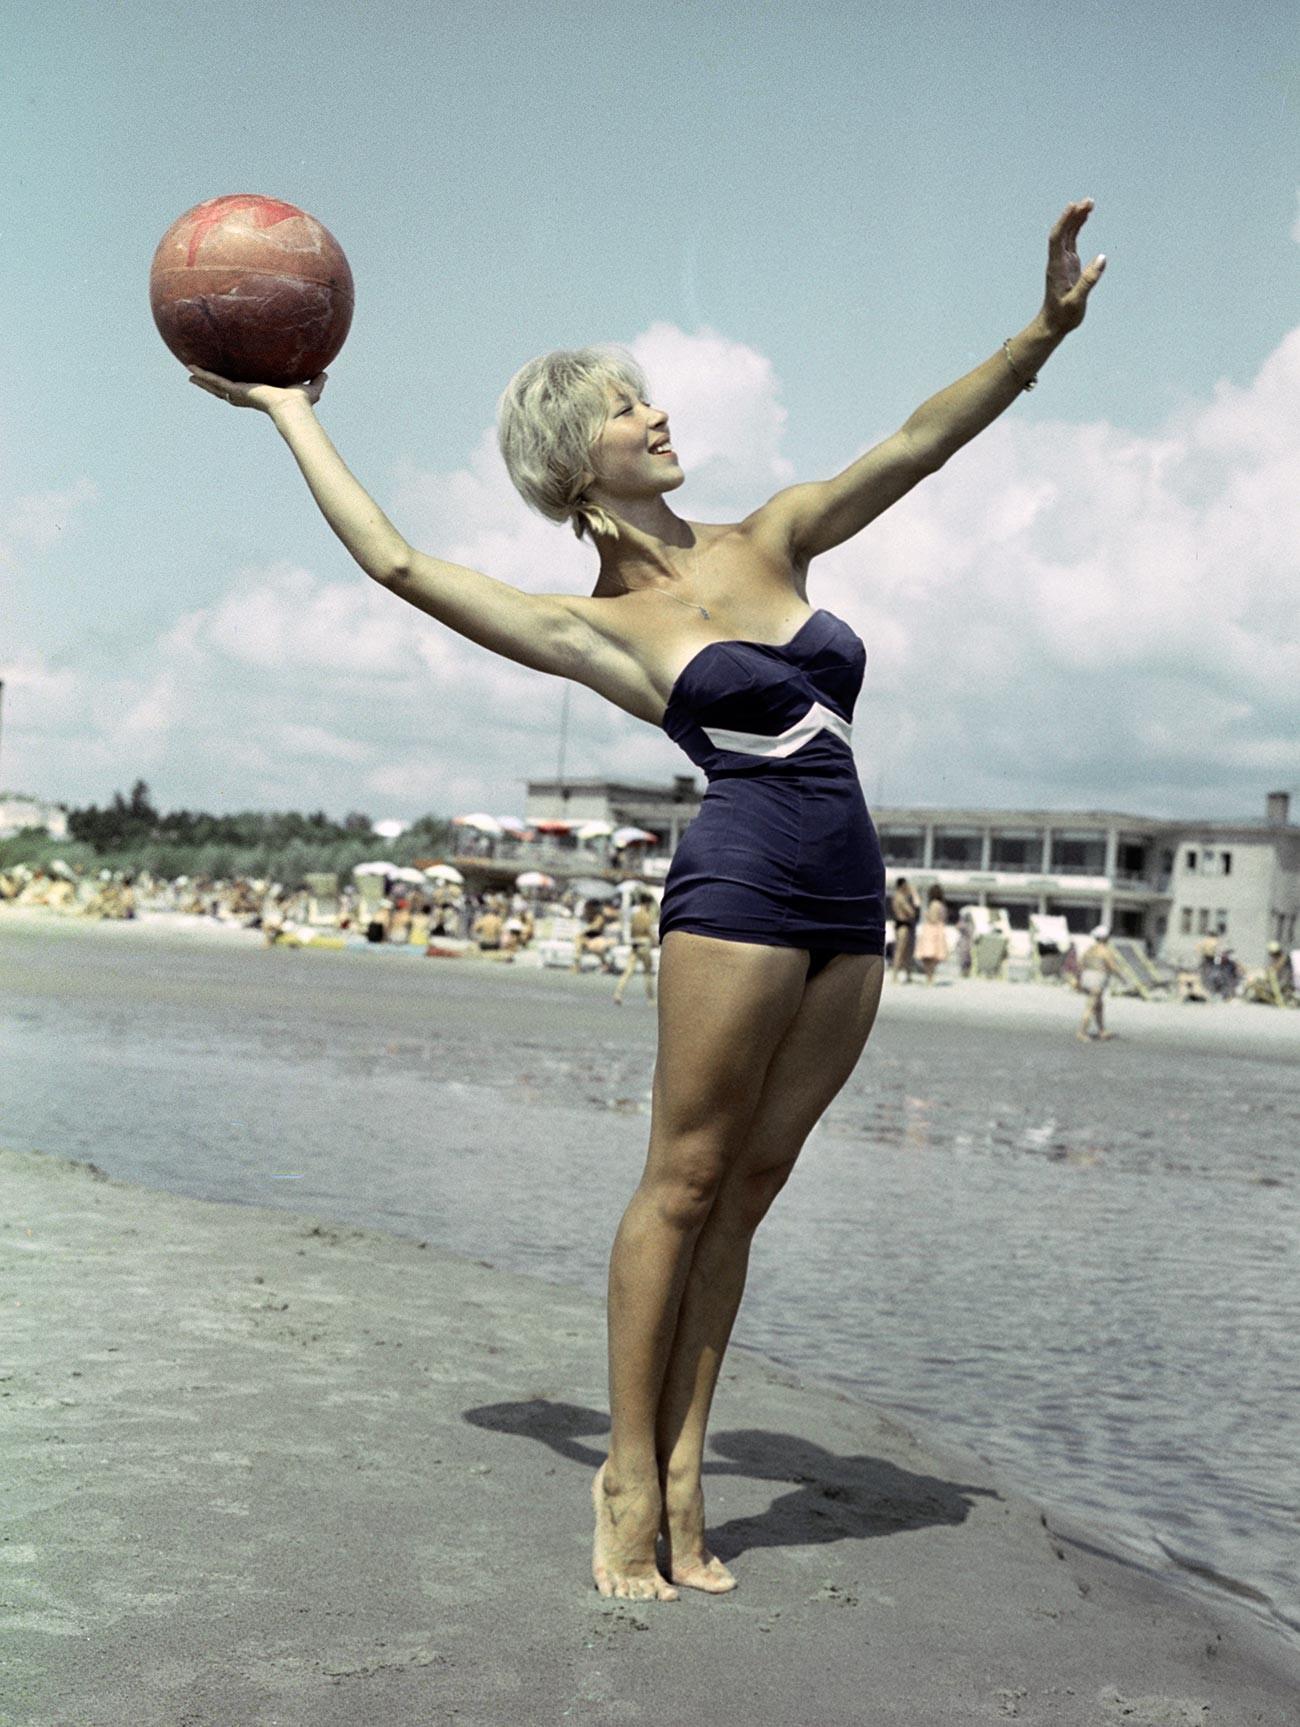 At the beach in Estonian SSR, 1960s